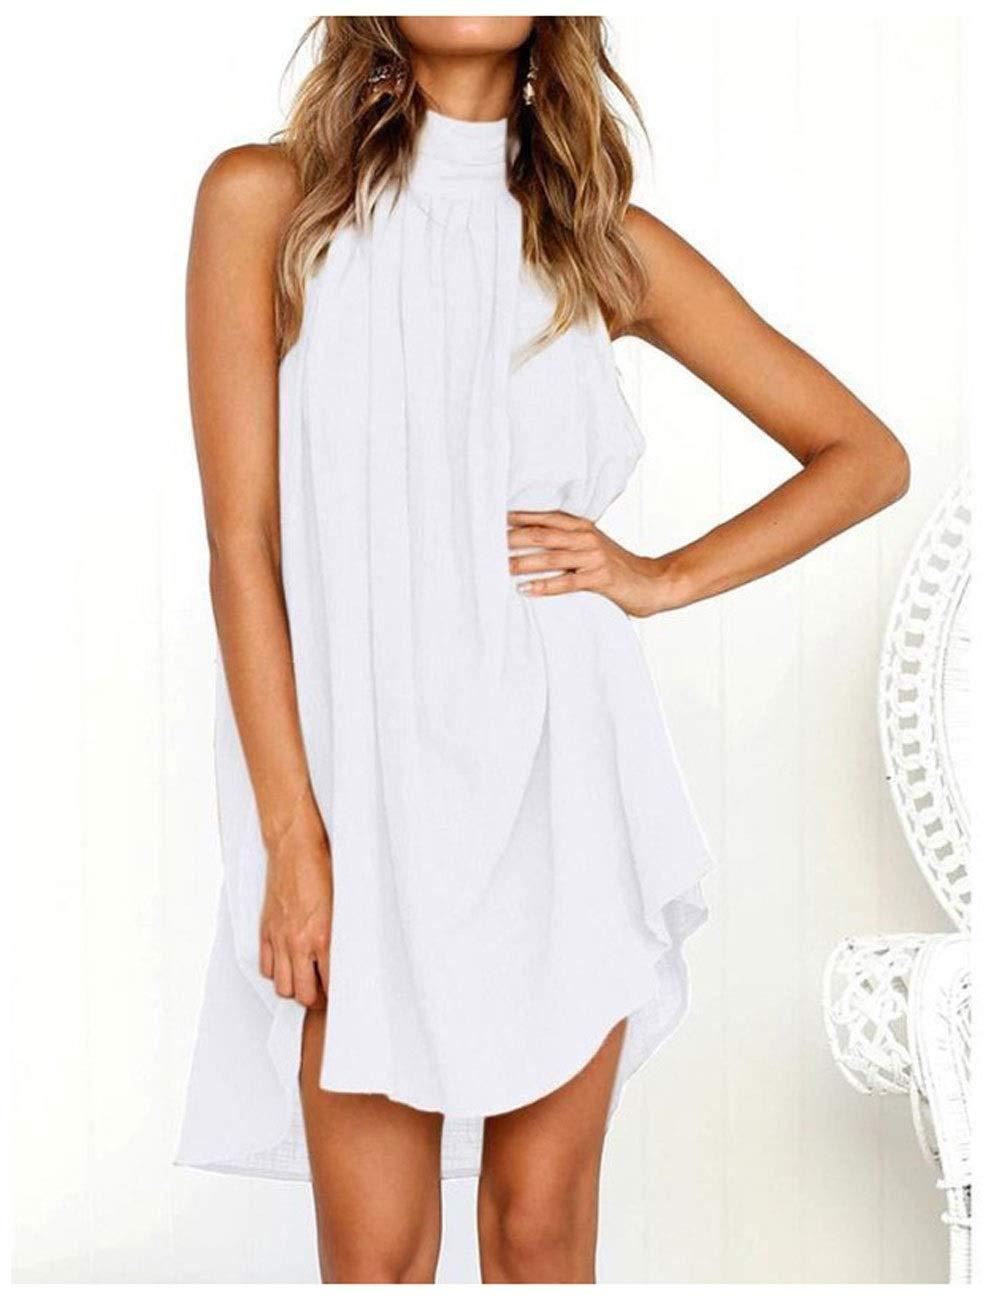 C LLJ Summer Cotton and Linen Women's Vest Dress Round Neck Folds Sleeveless Backless Skirt Irregular Beach Skirt (color   D)